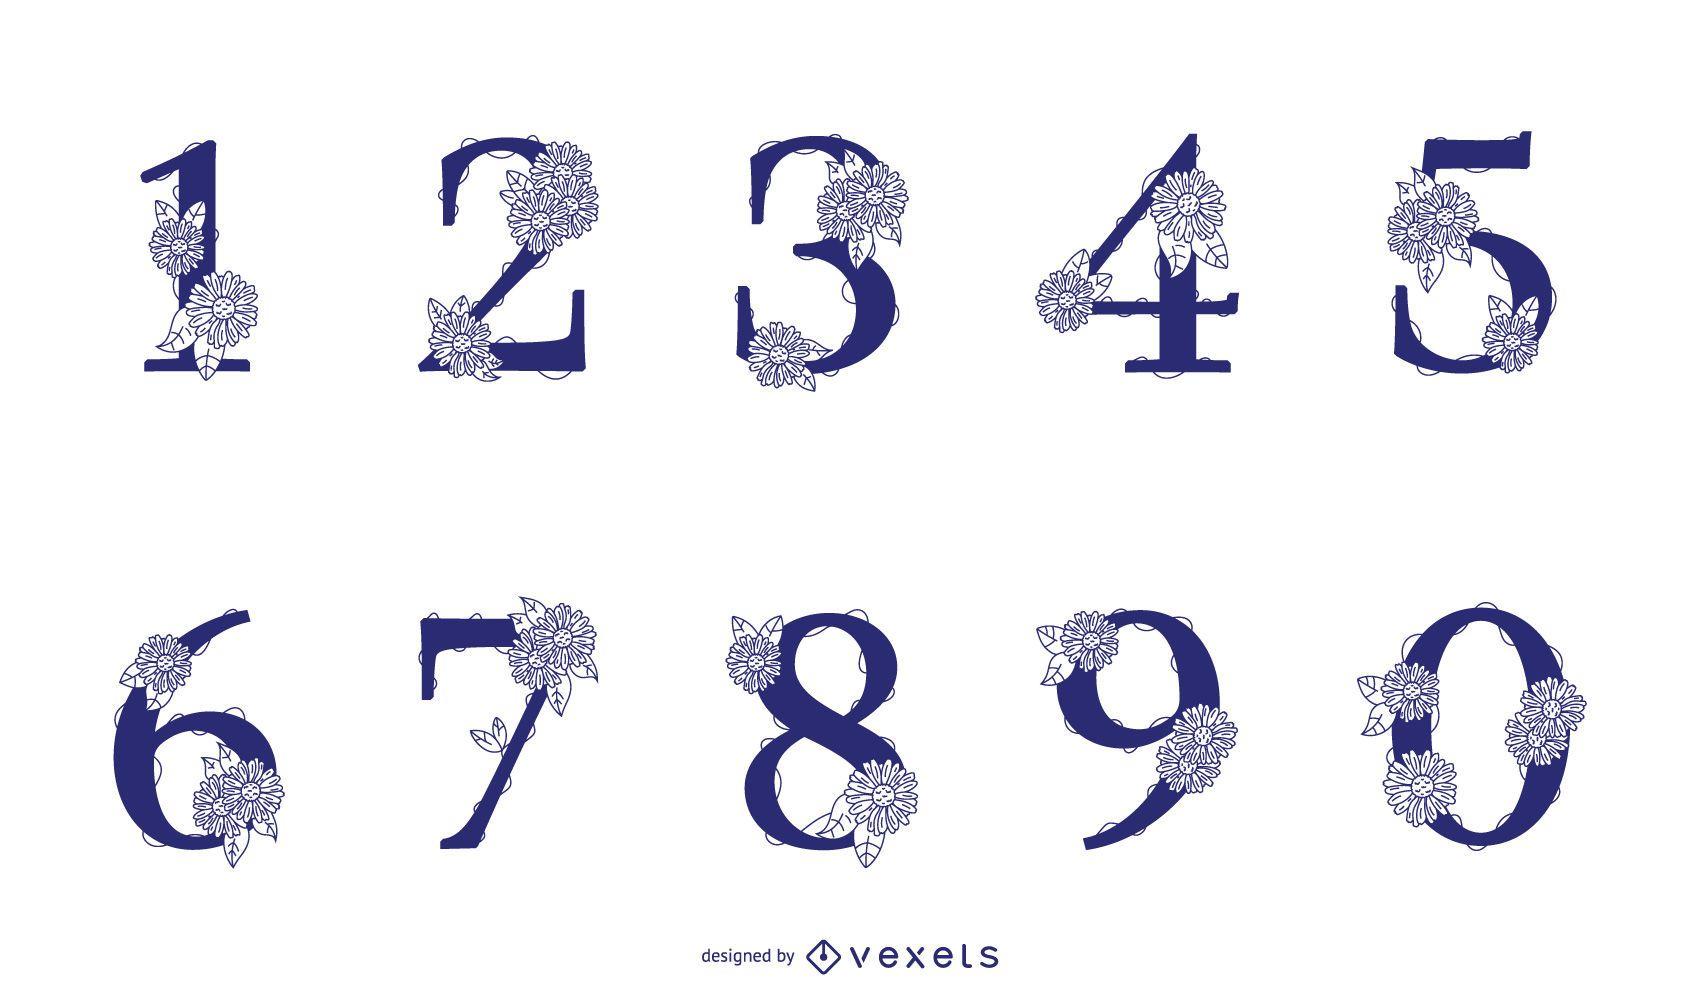 Paquete de diseño de números florales